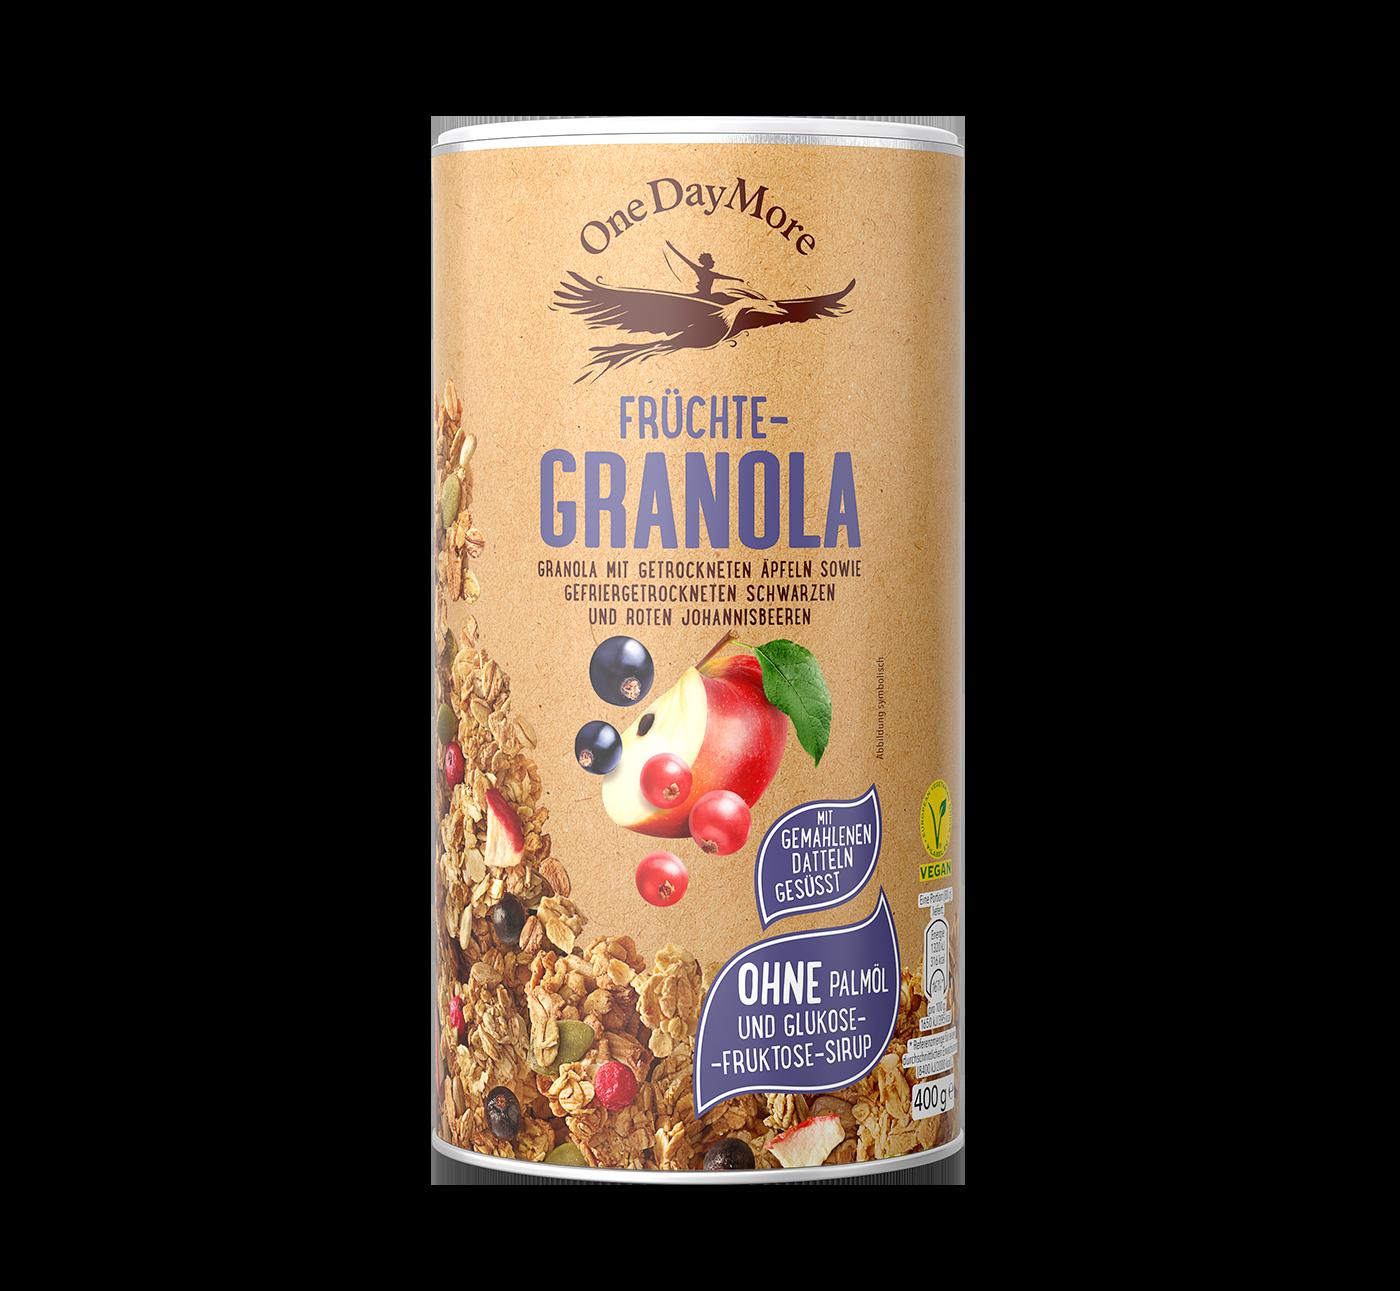 fruechte-granola-onedaymore-tuba-front-1400×1291